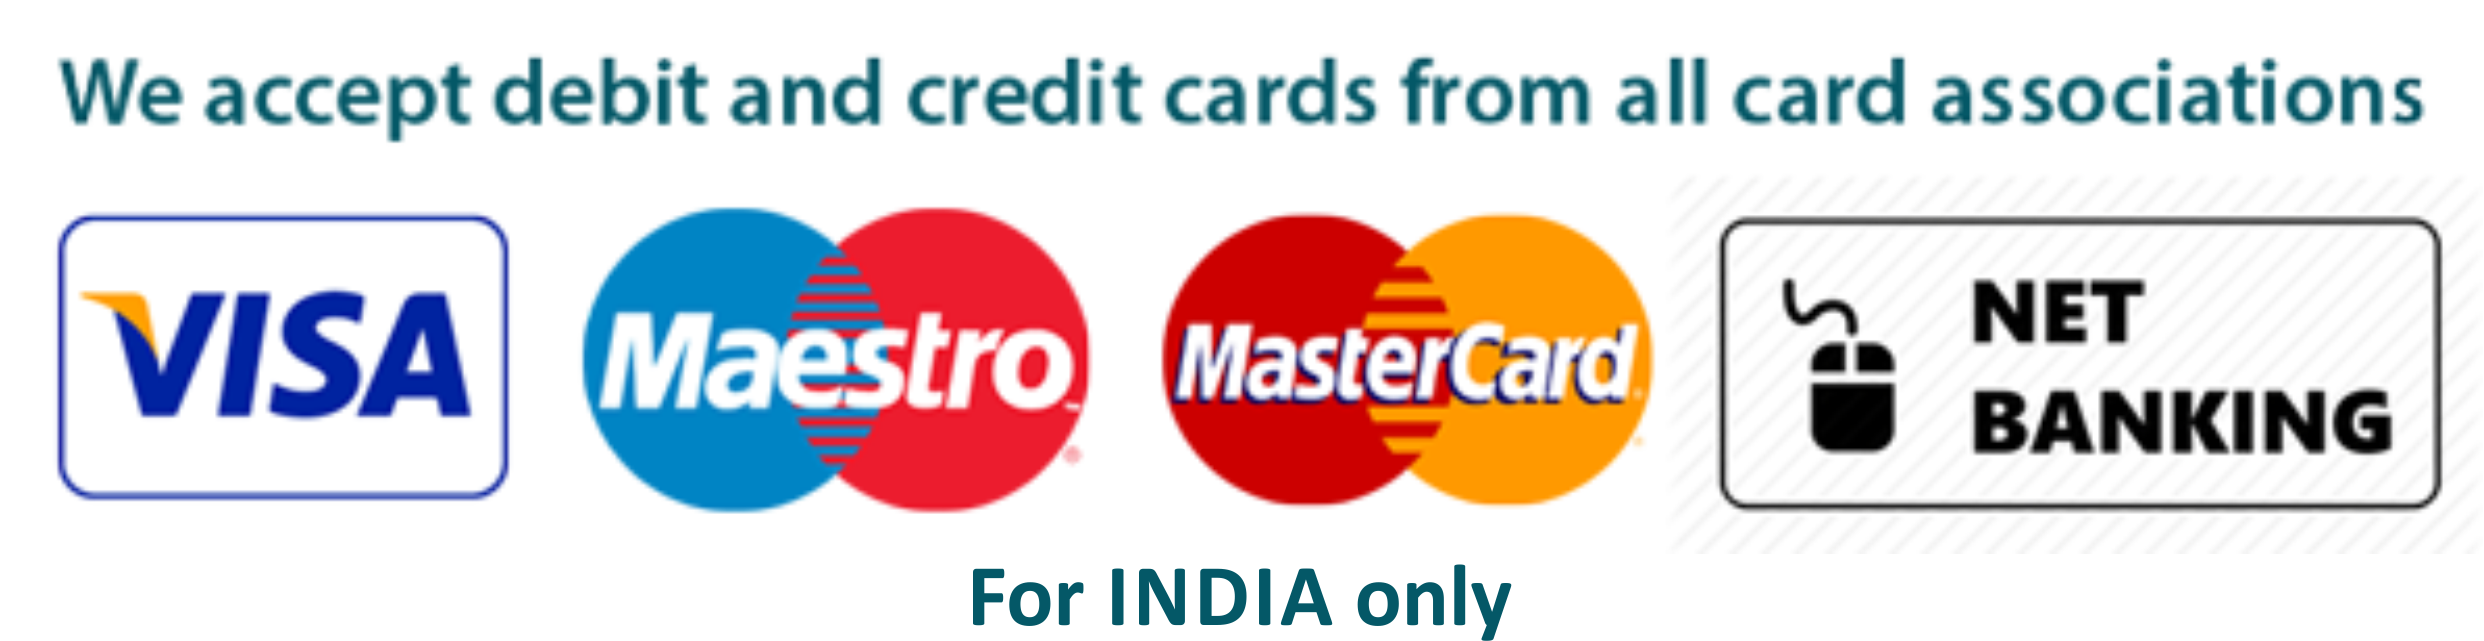 visa-button